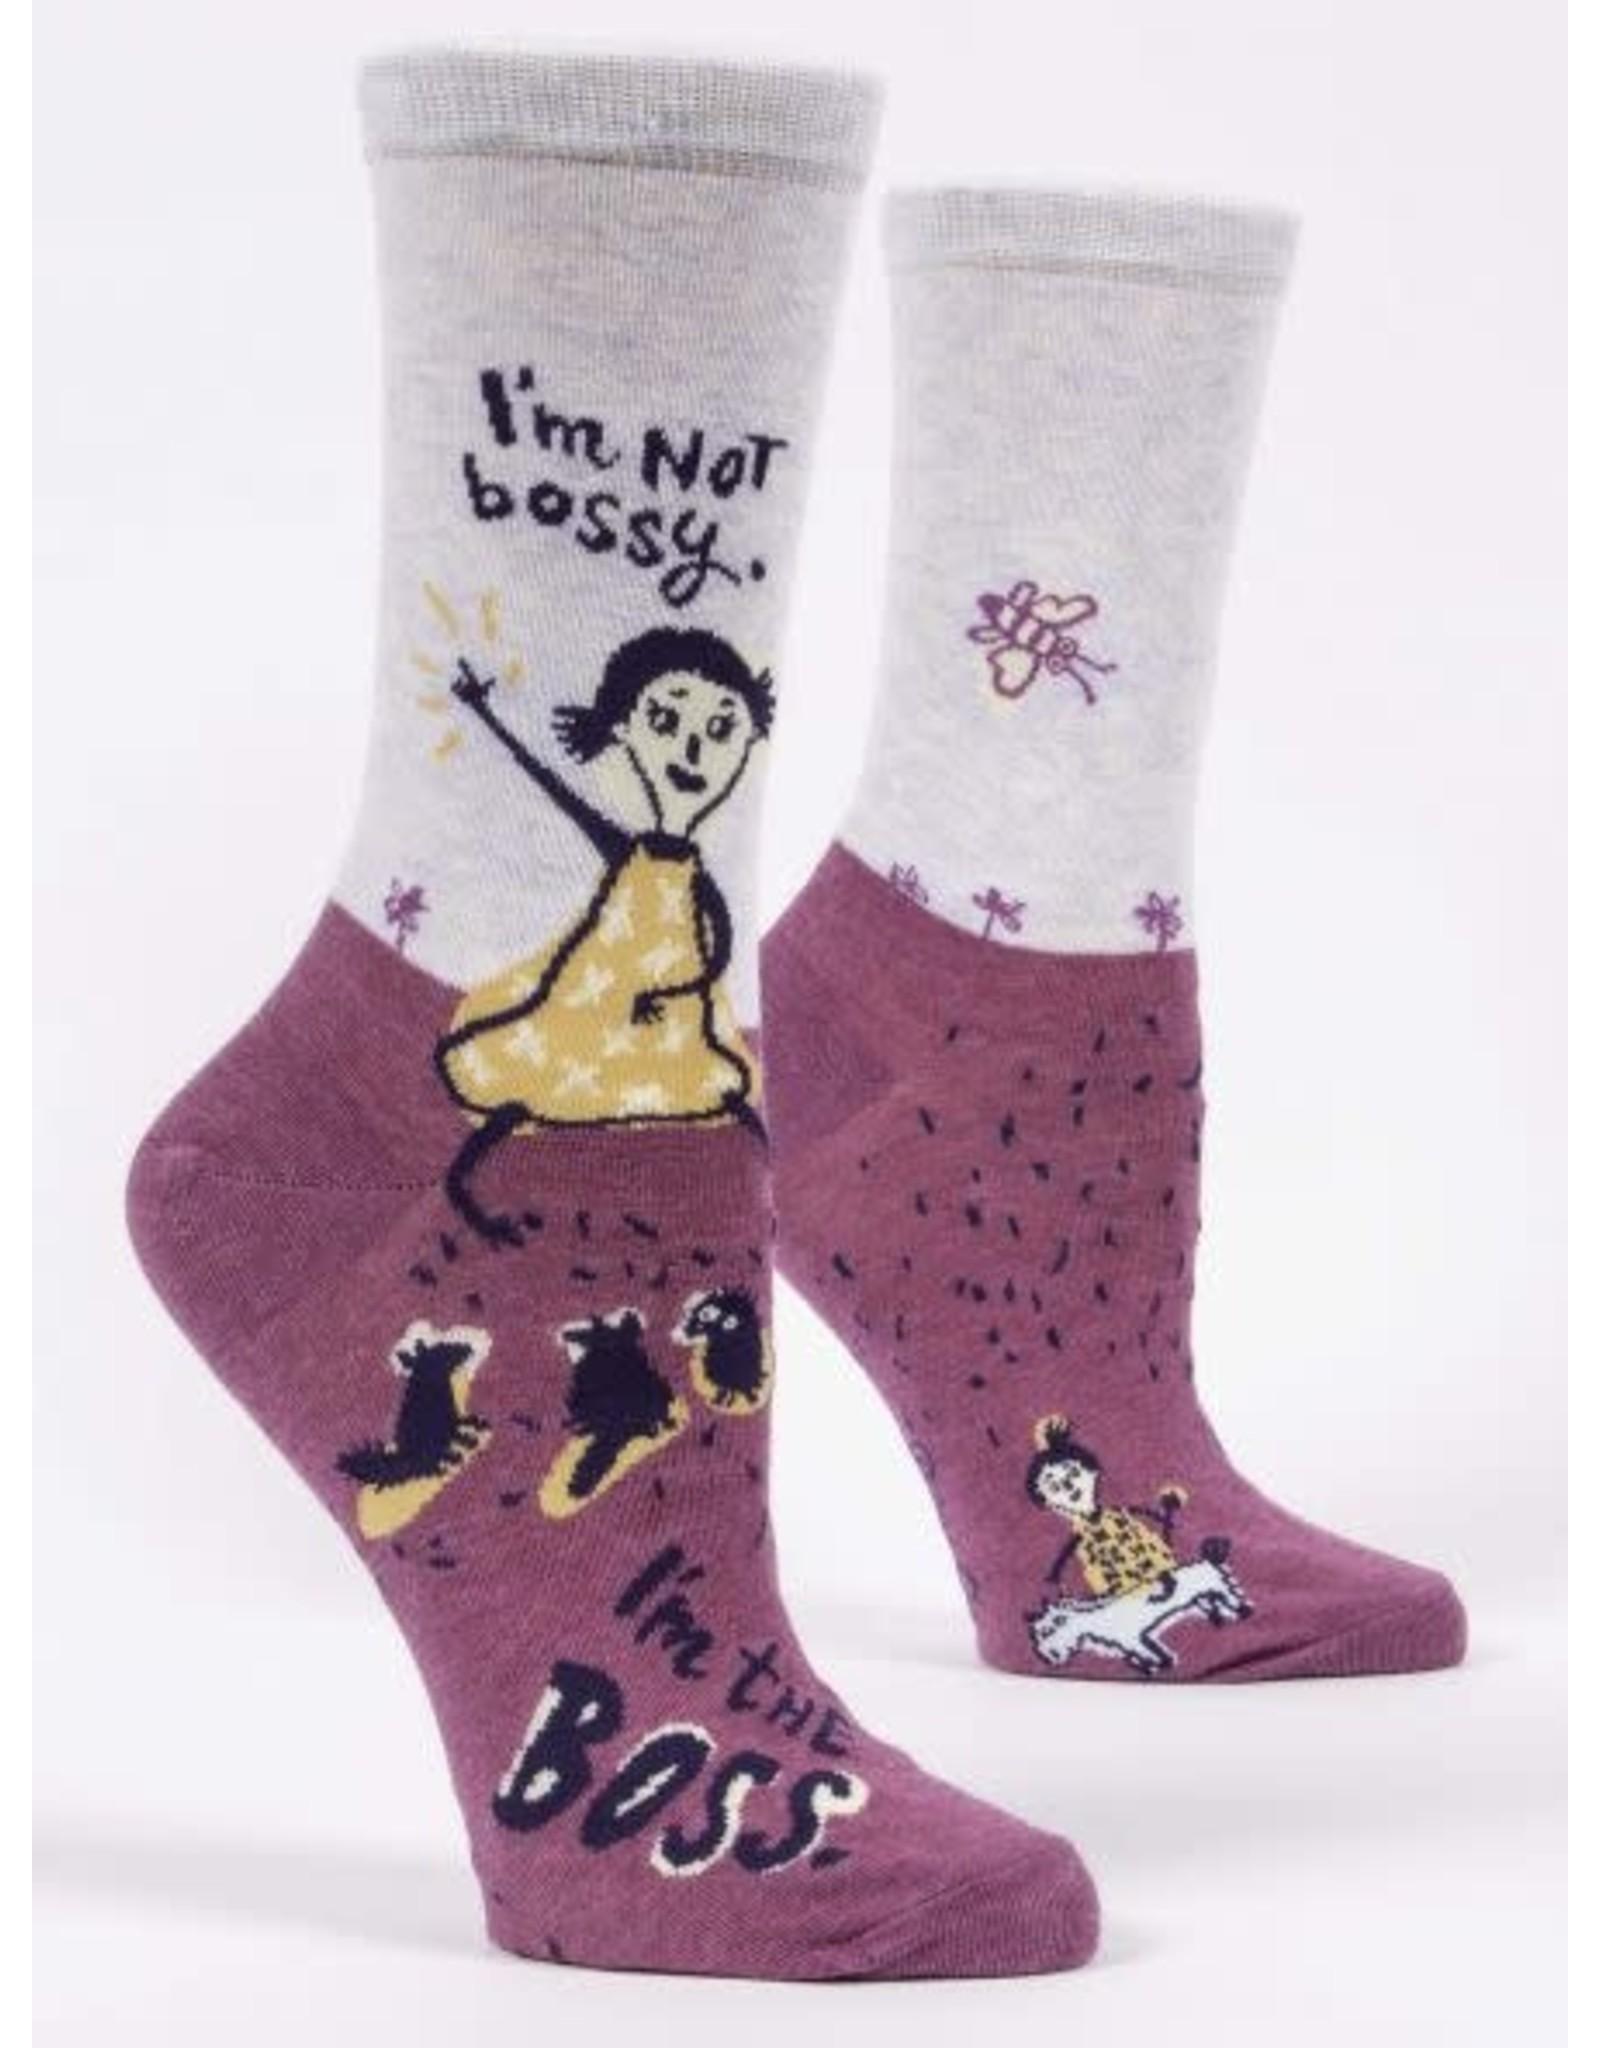 BQ Sassy Socks - Bossy